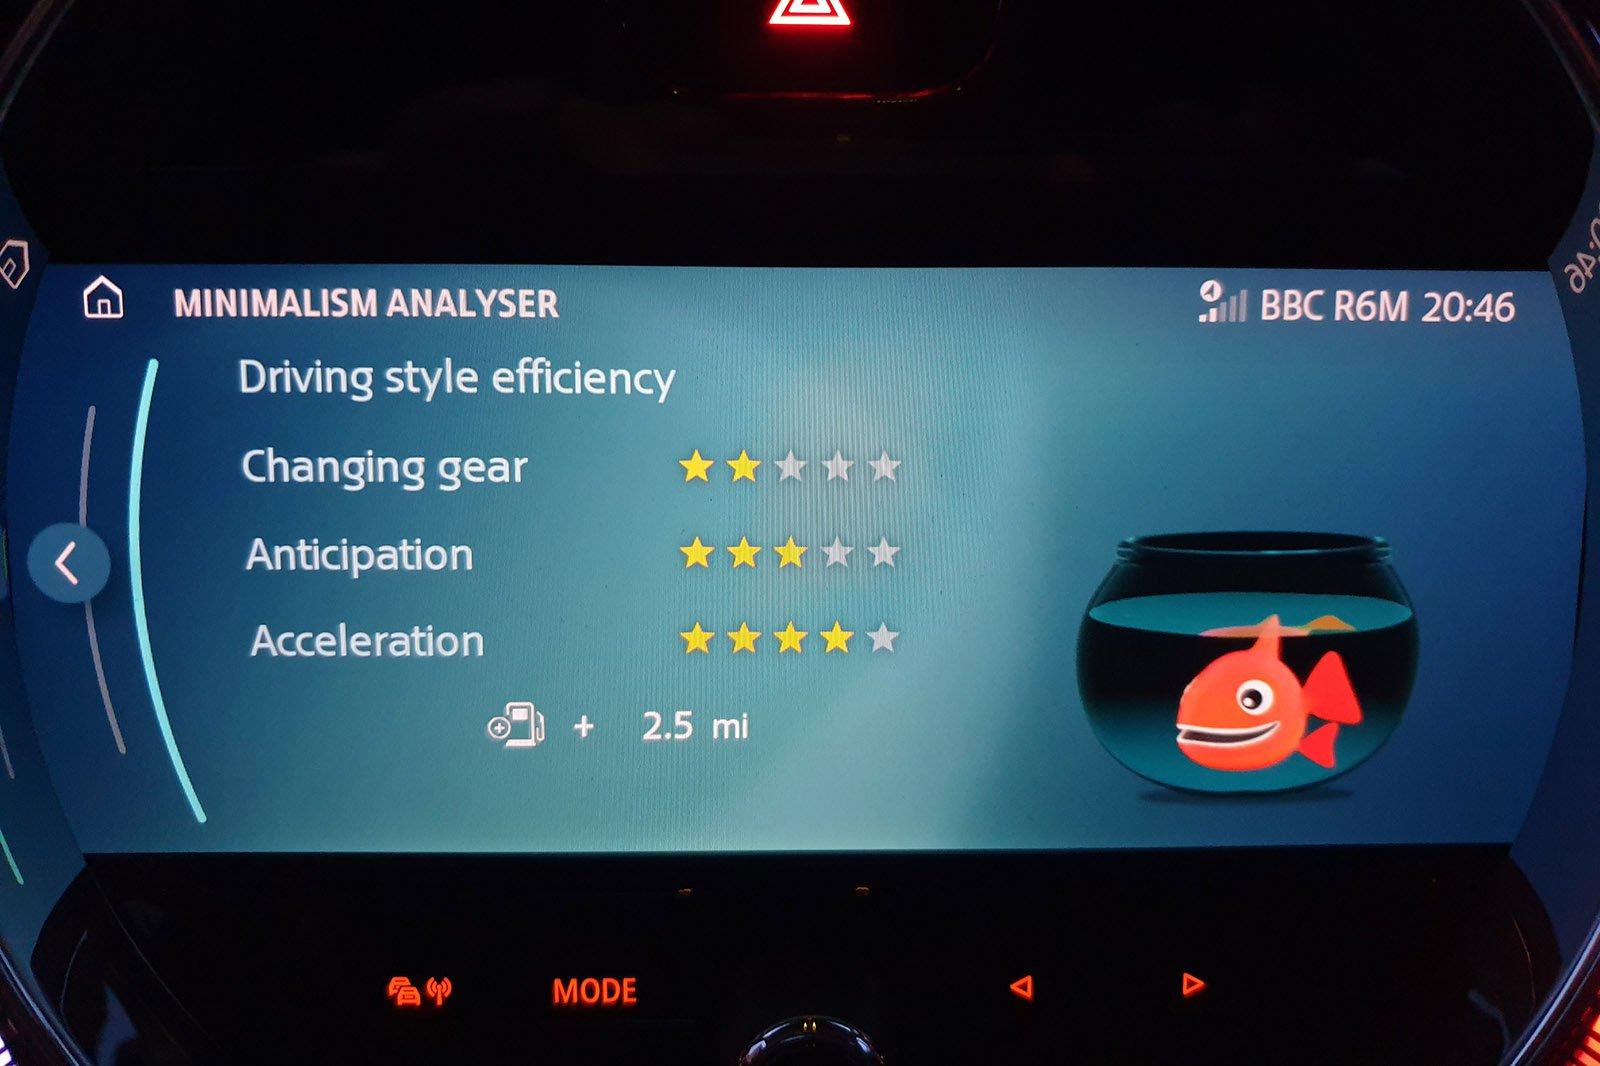 2021 Mini Hatch long-term economy goldfish